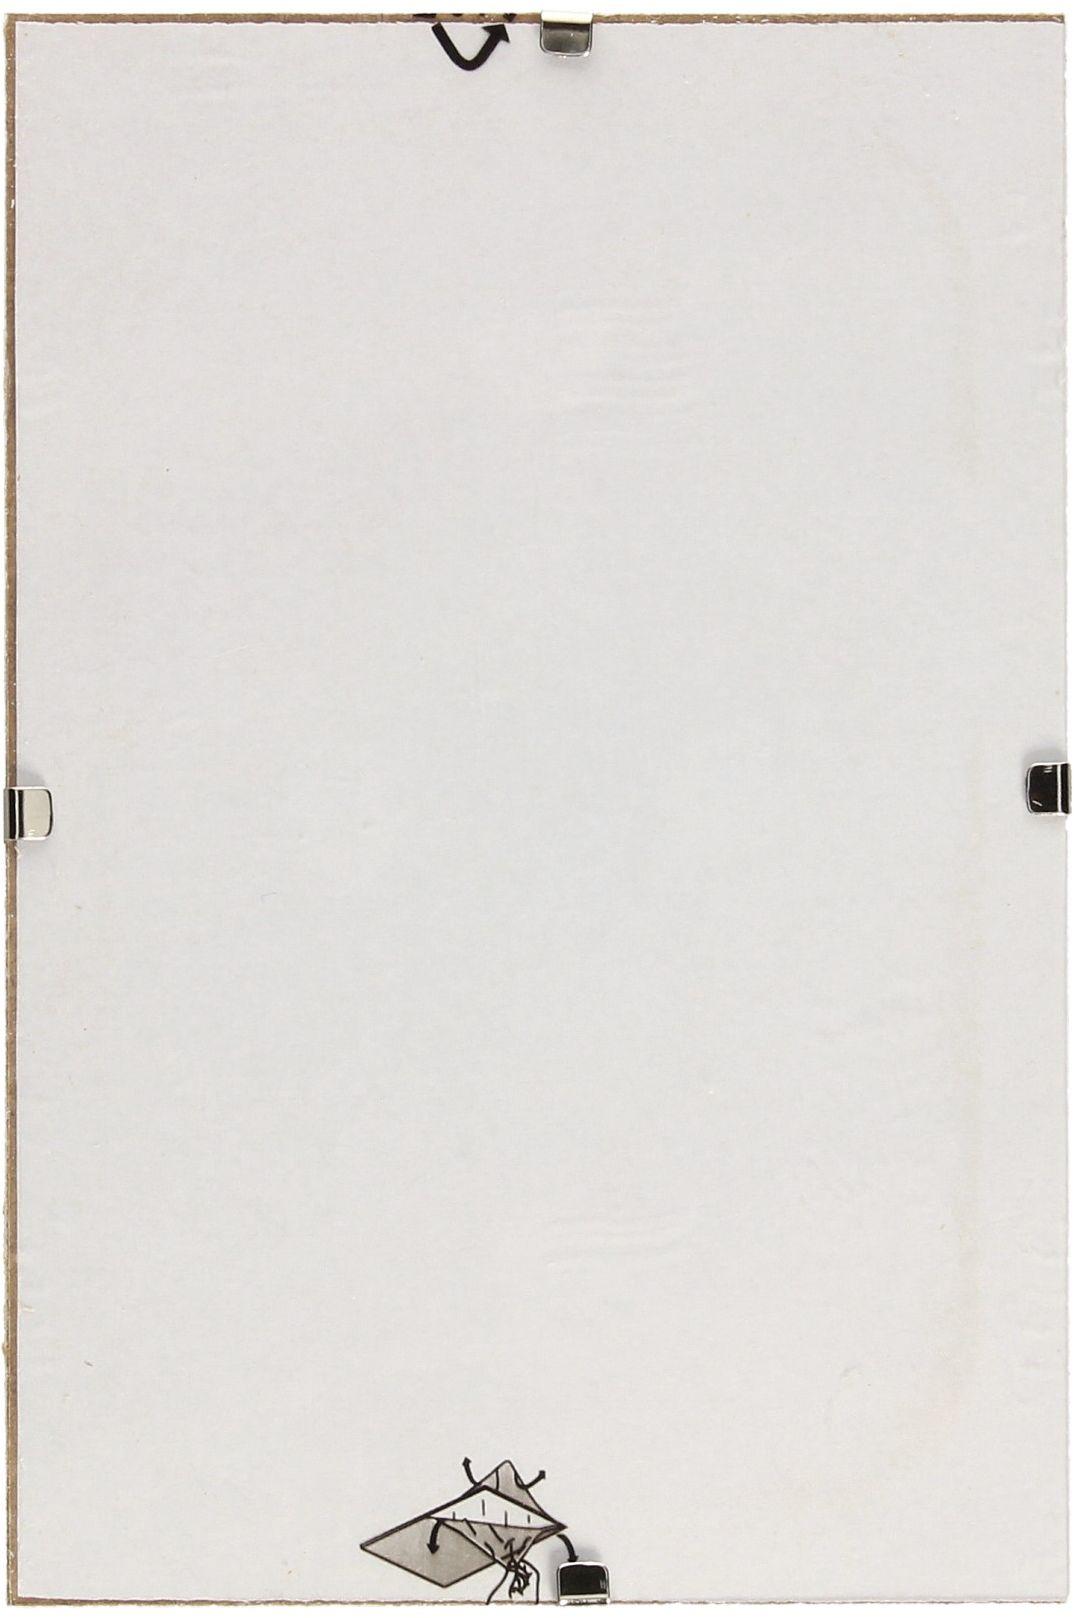 Antyrama 10x15 plexi Arpol